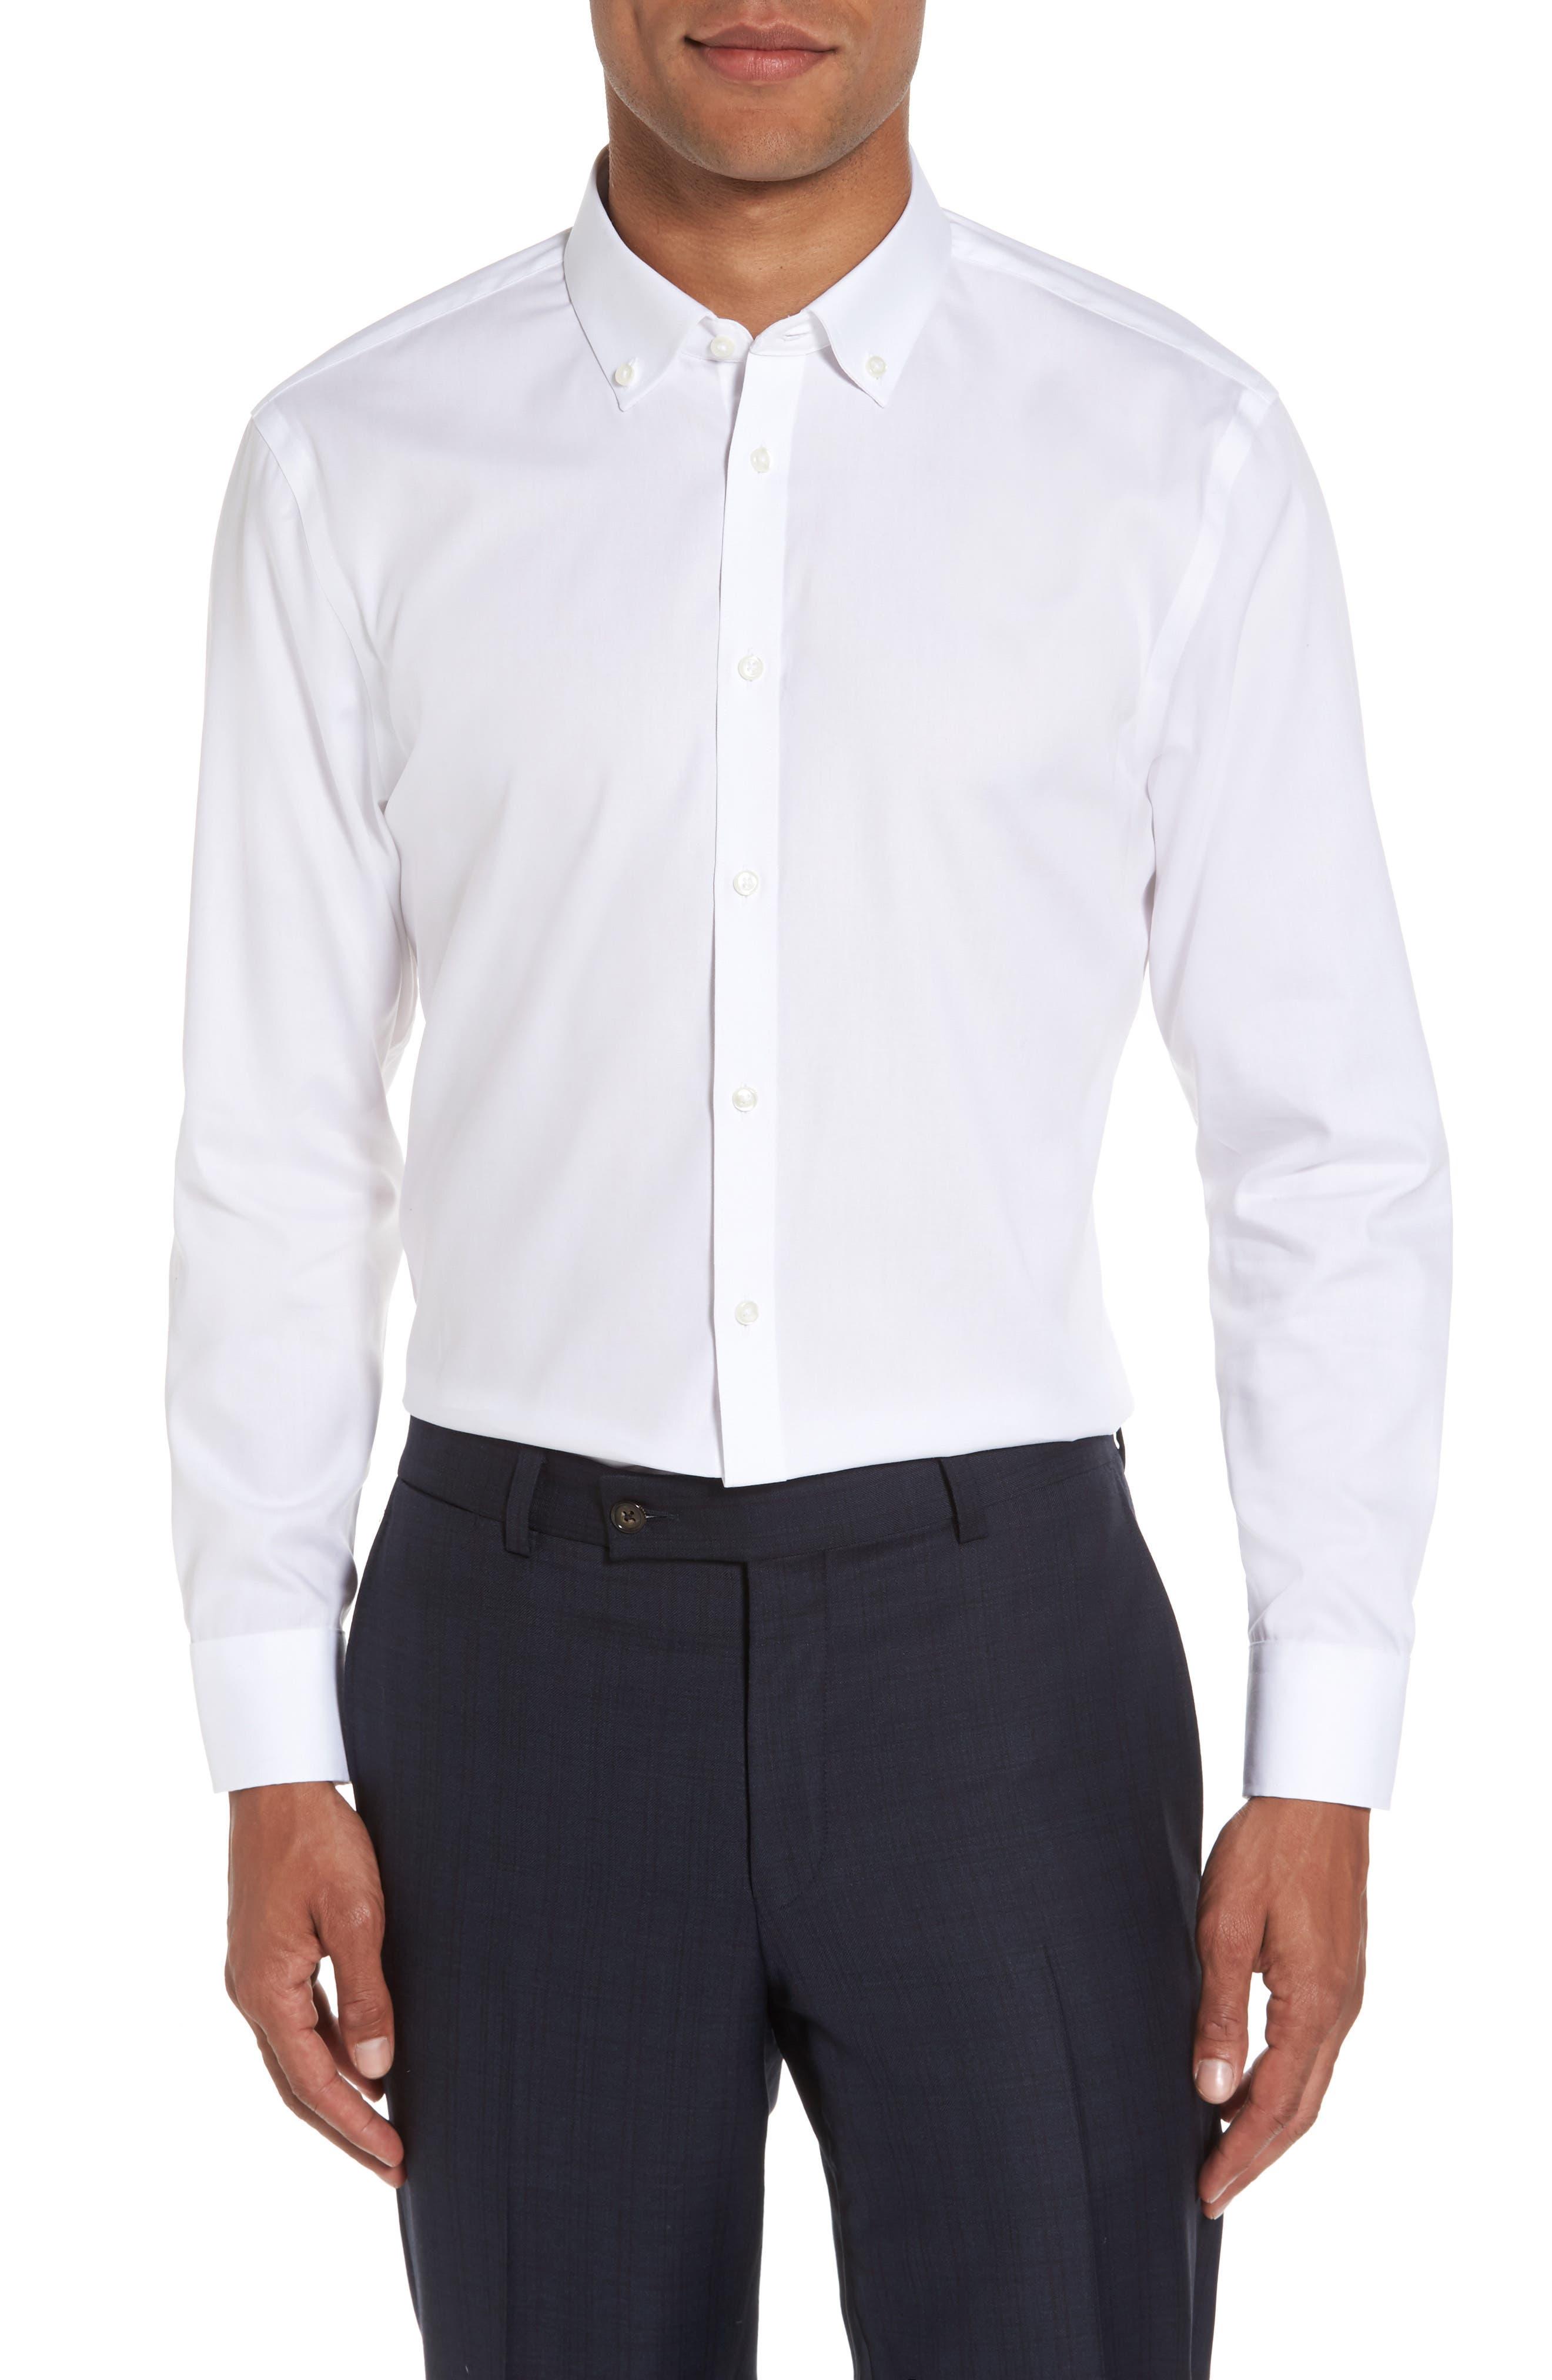 Alternate Image 2  - Nordstrom Men's Shop Extra Trim Fit Non-Iron Solid Dress Shirt